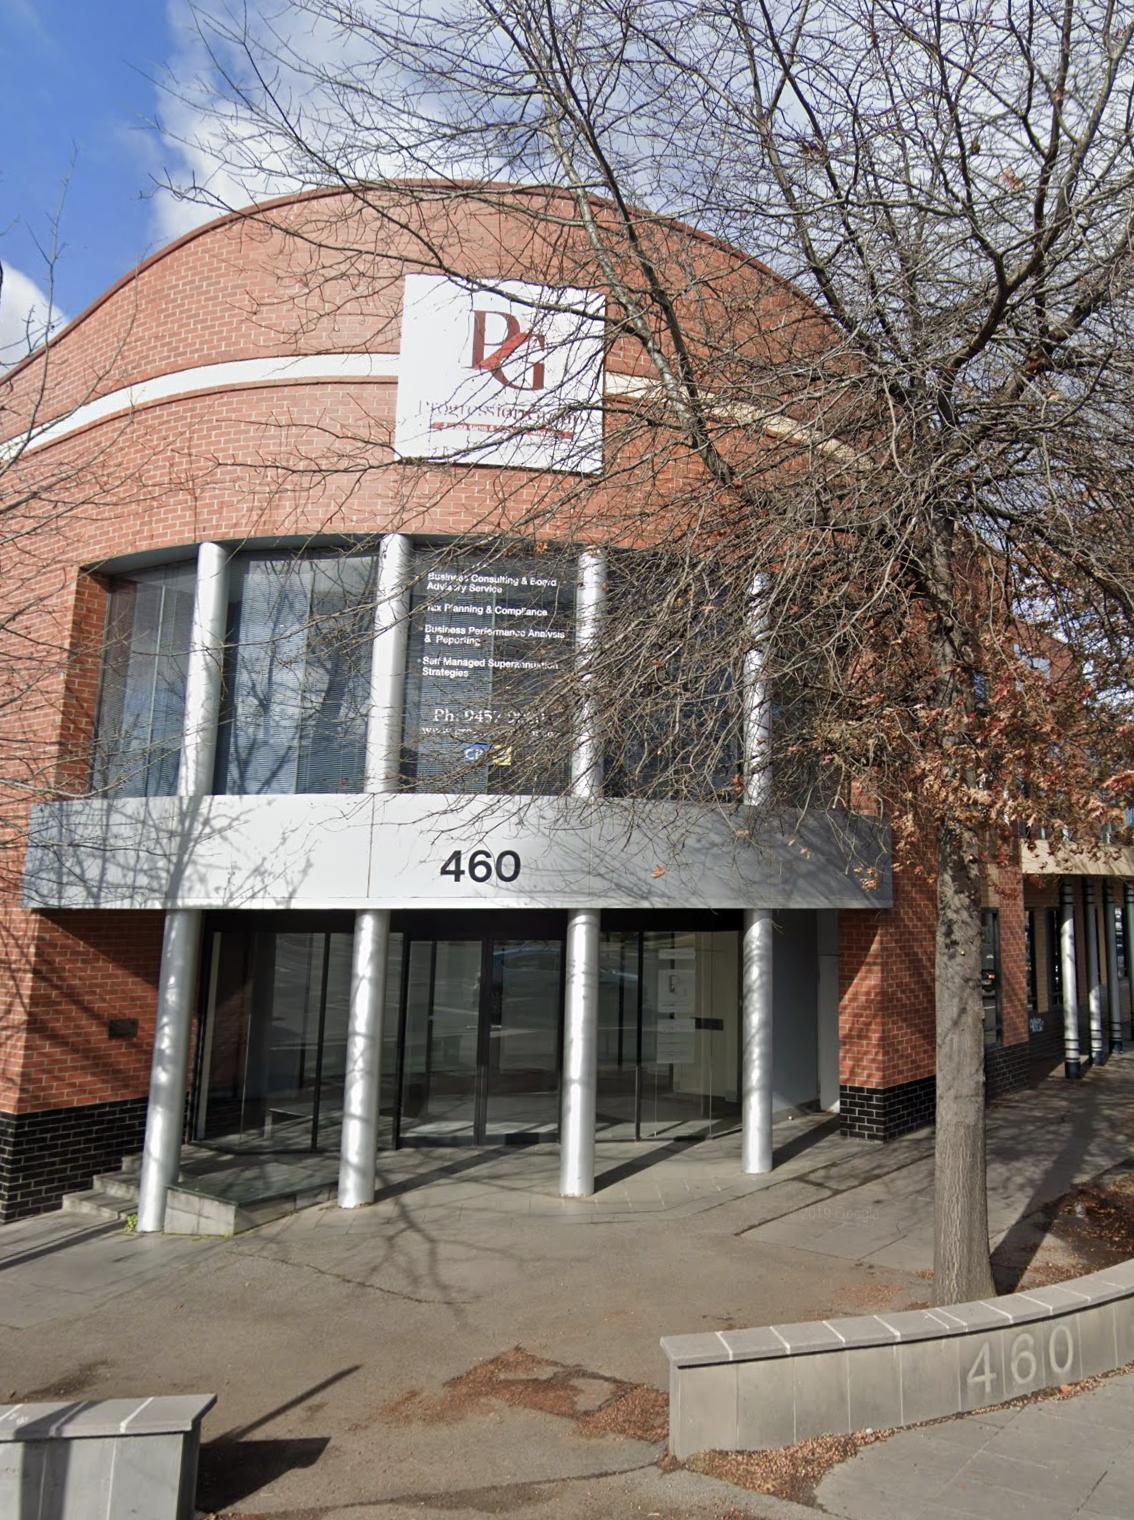 Progression Group headquarters based in Heidelberg